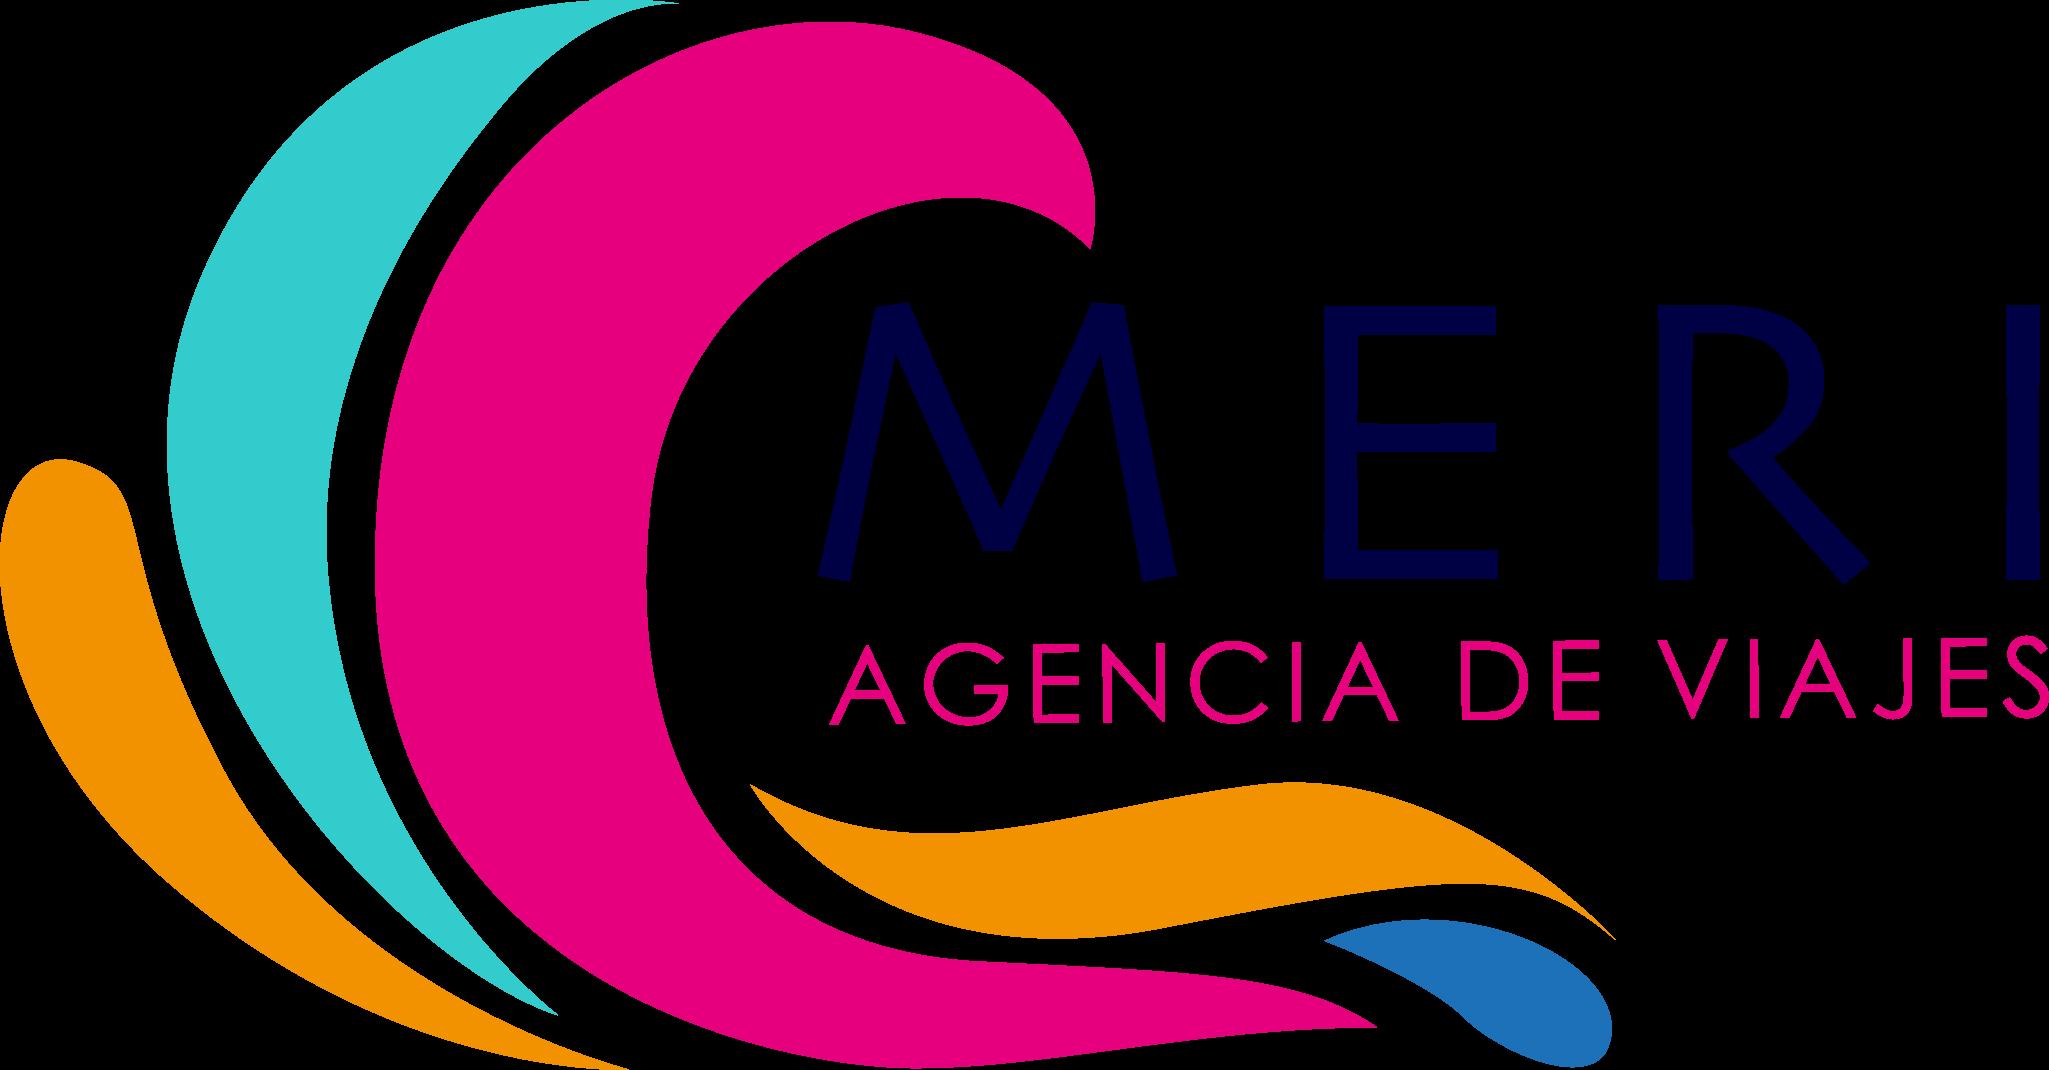 Viajes Meri - Agencia de Viajes